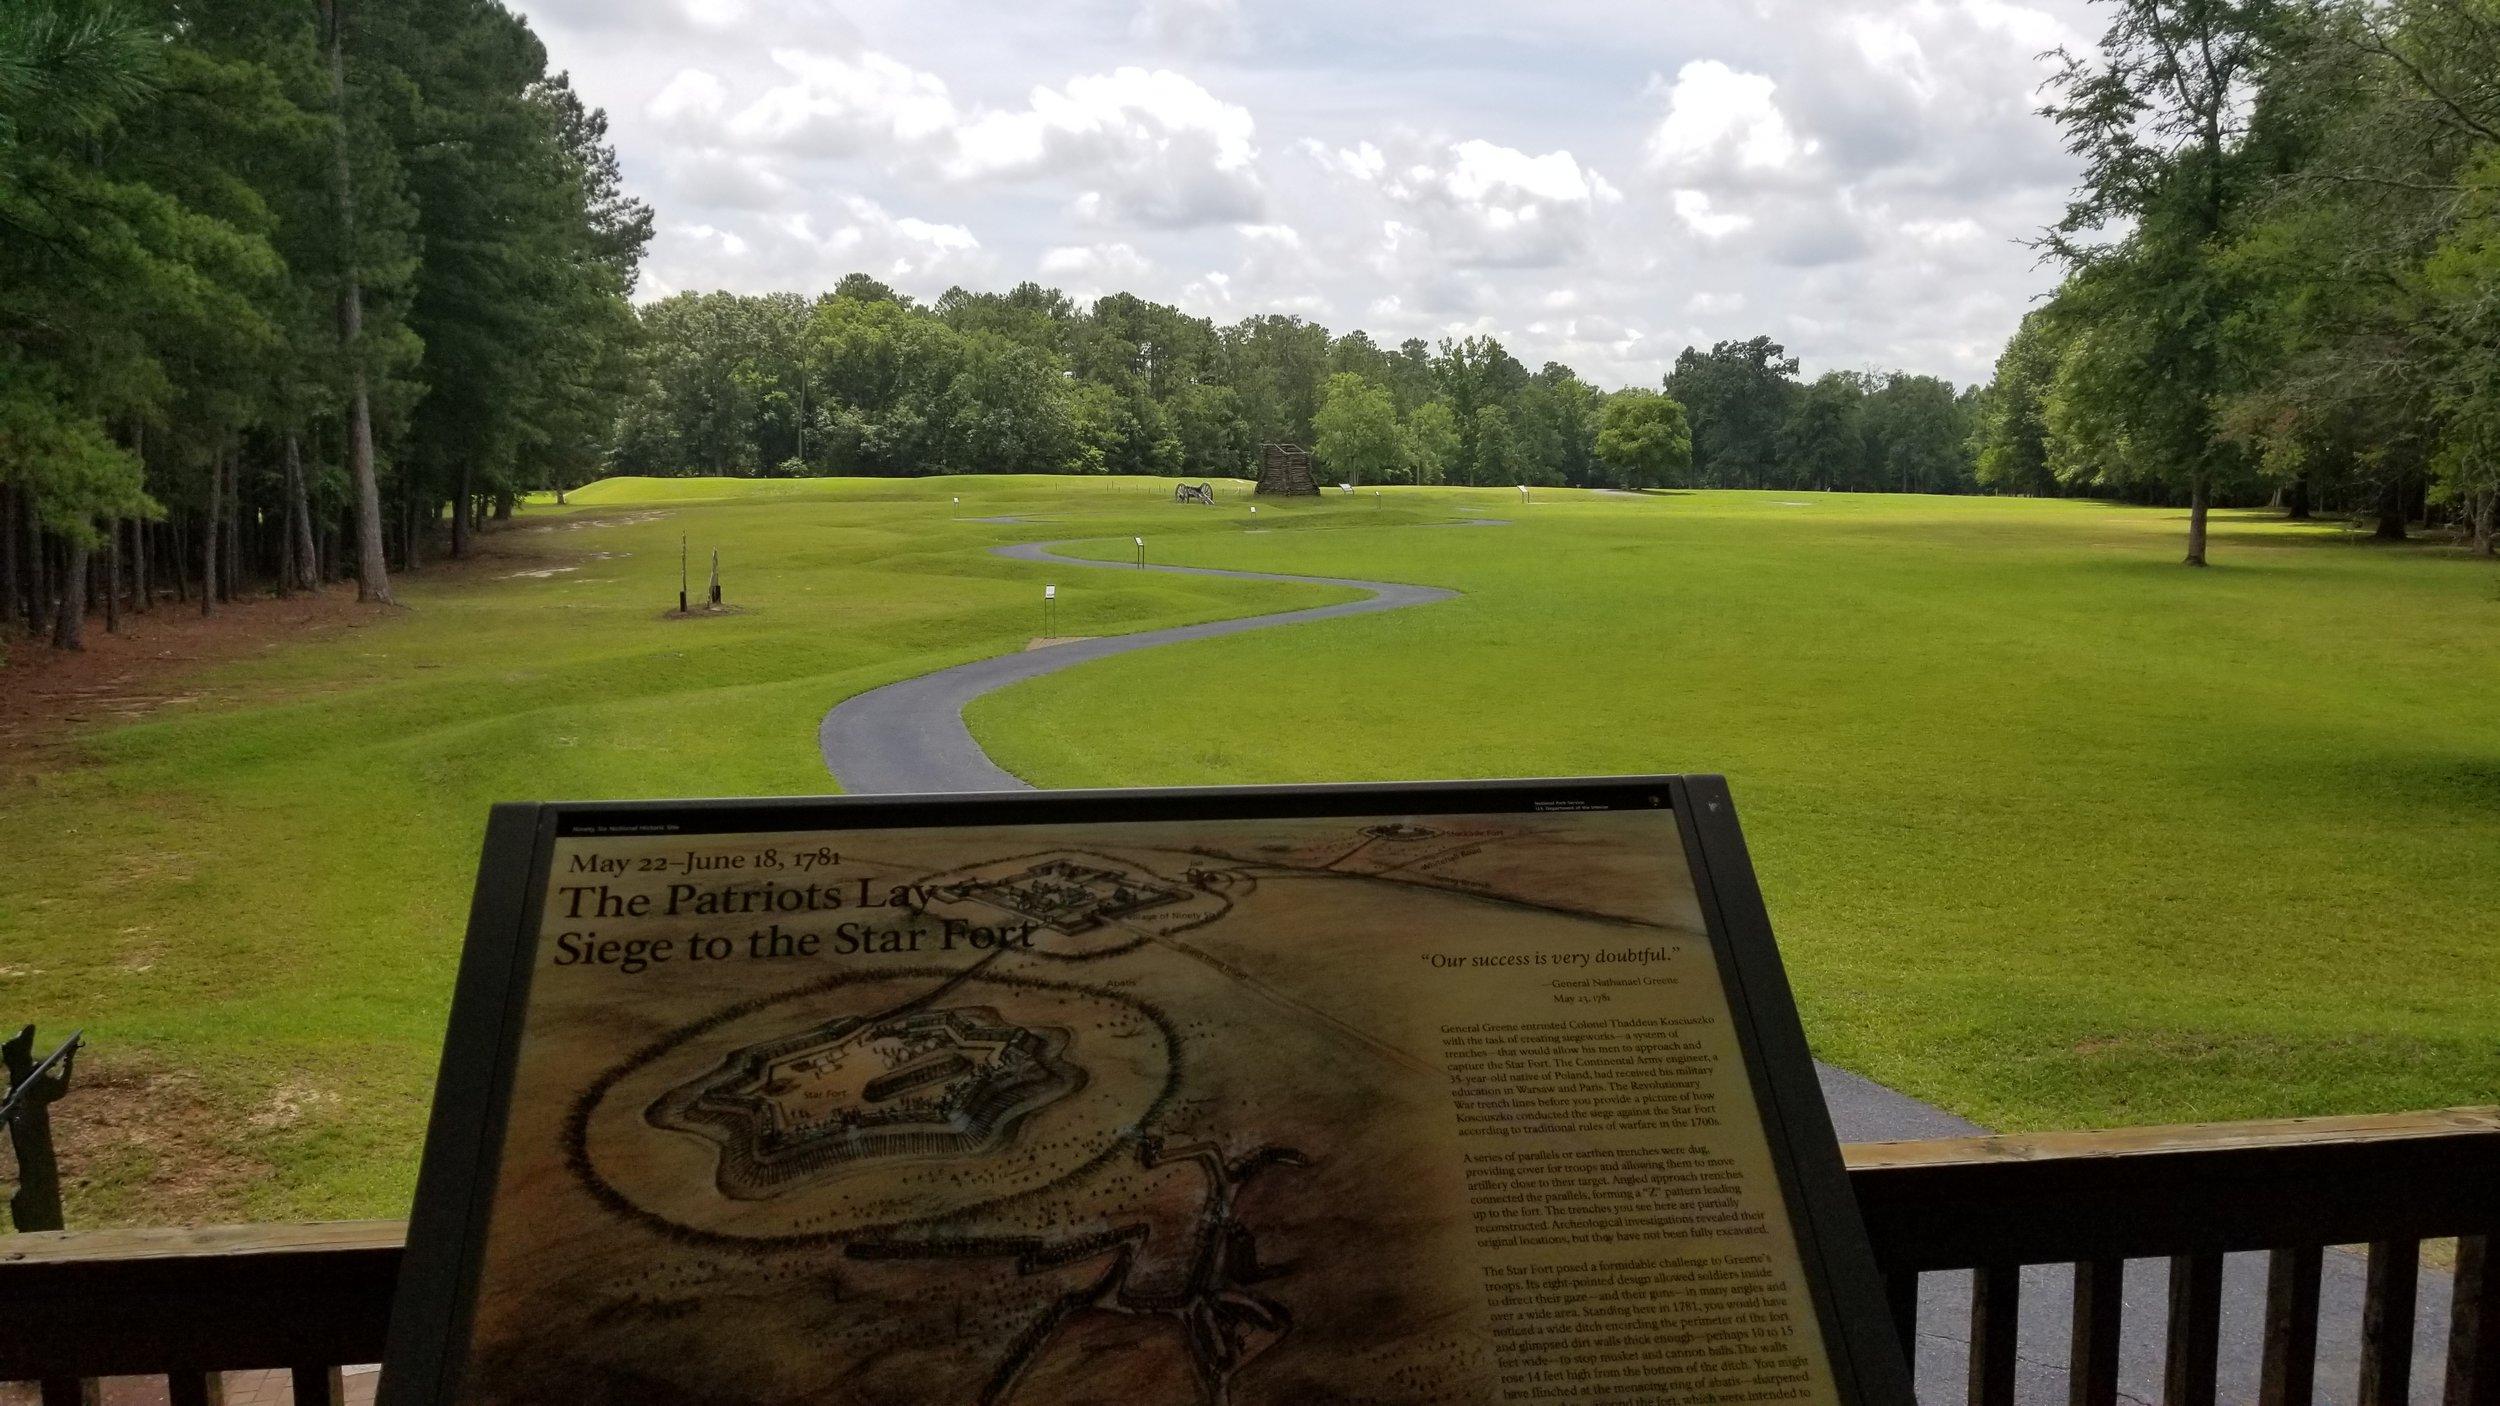 Battlefield overlook at Ninety-Six